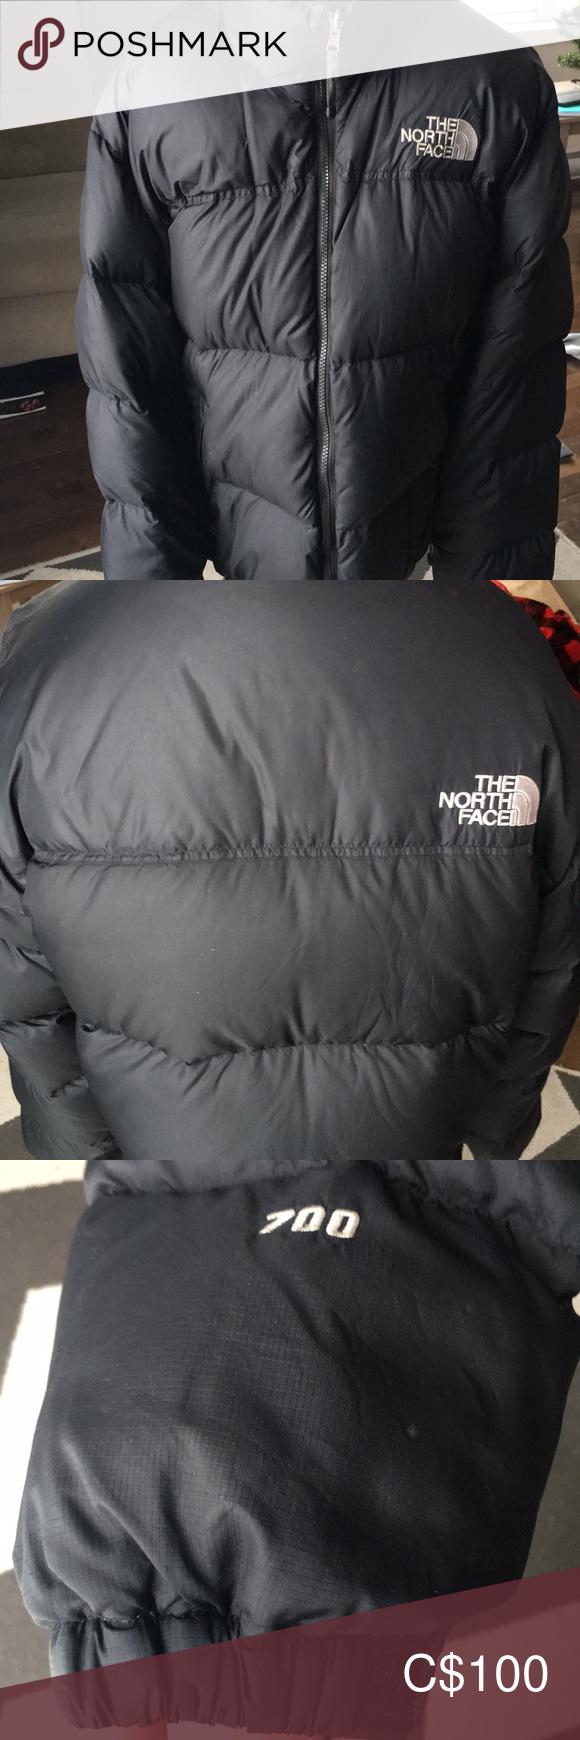 North Face Men S Jacket 700 North Face Mens North Face Jacket Mens The North Face [ 1740 x 580 Pixel ]